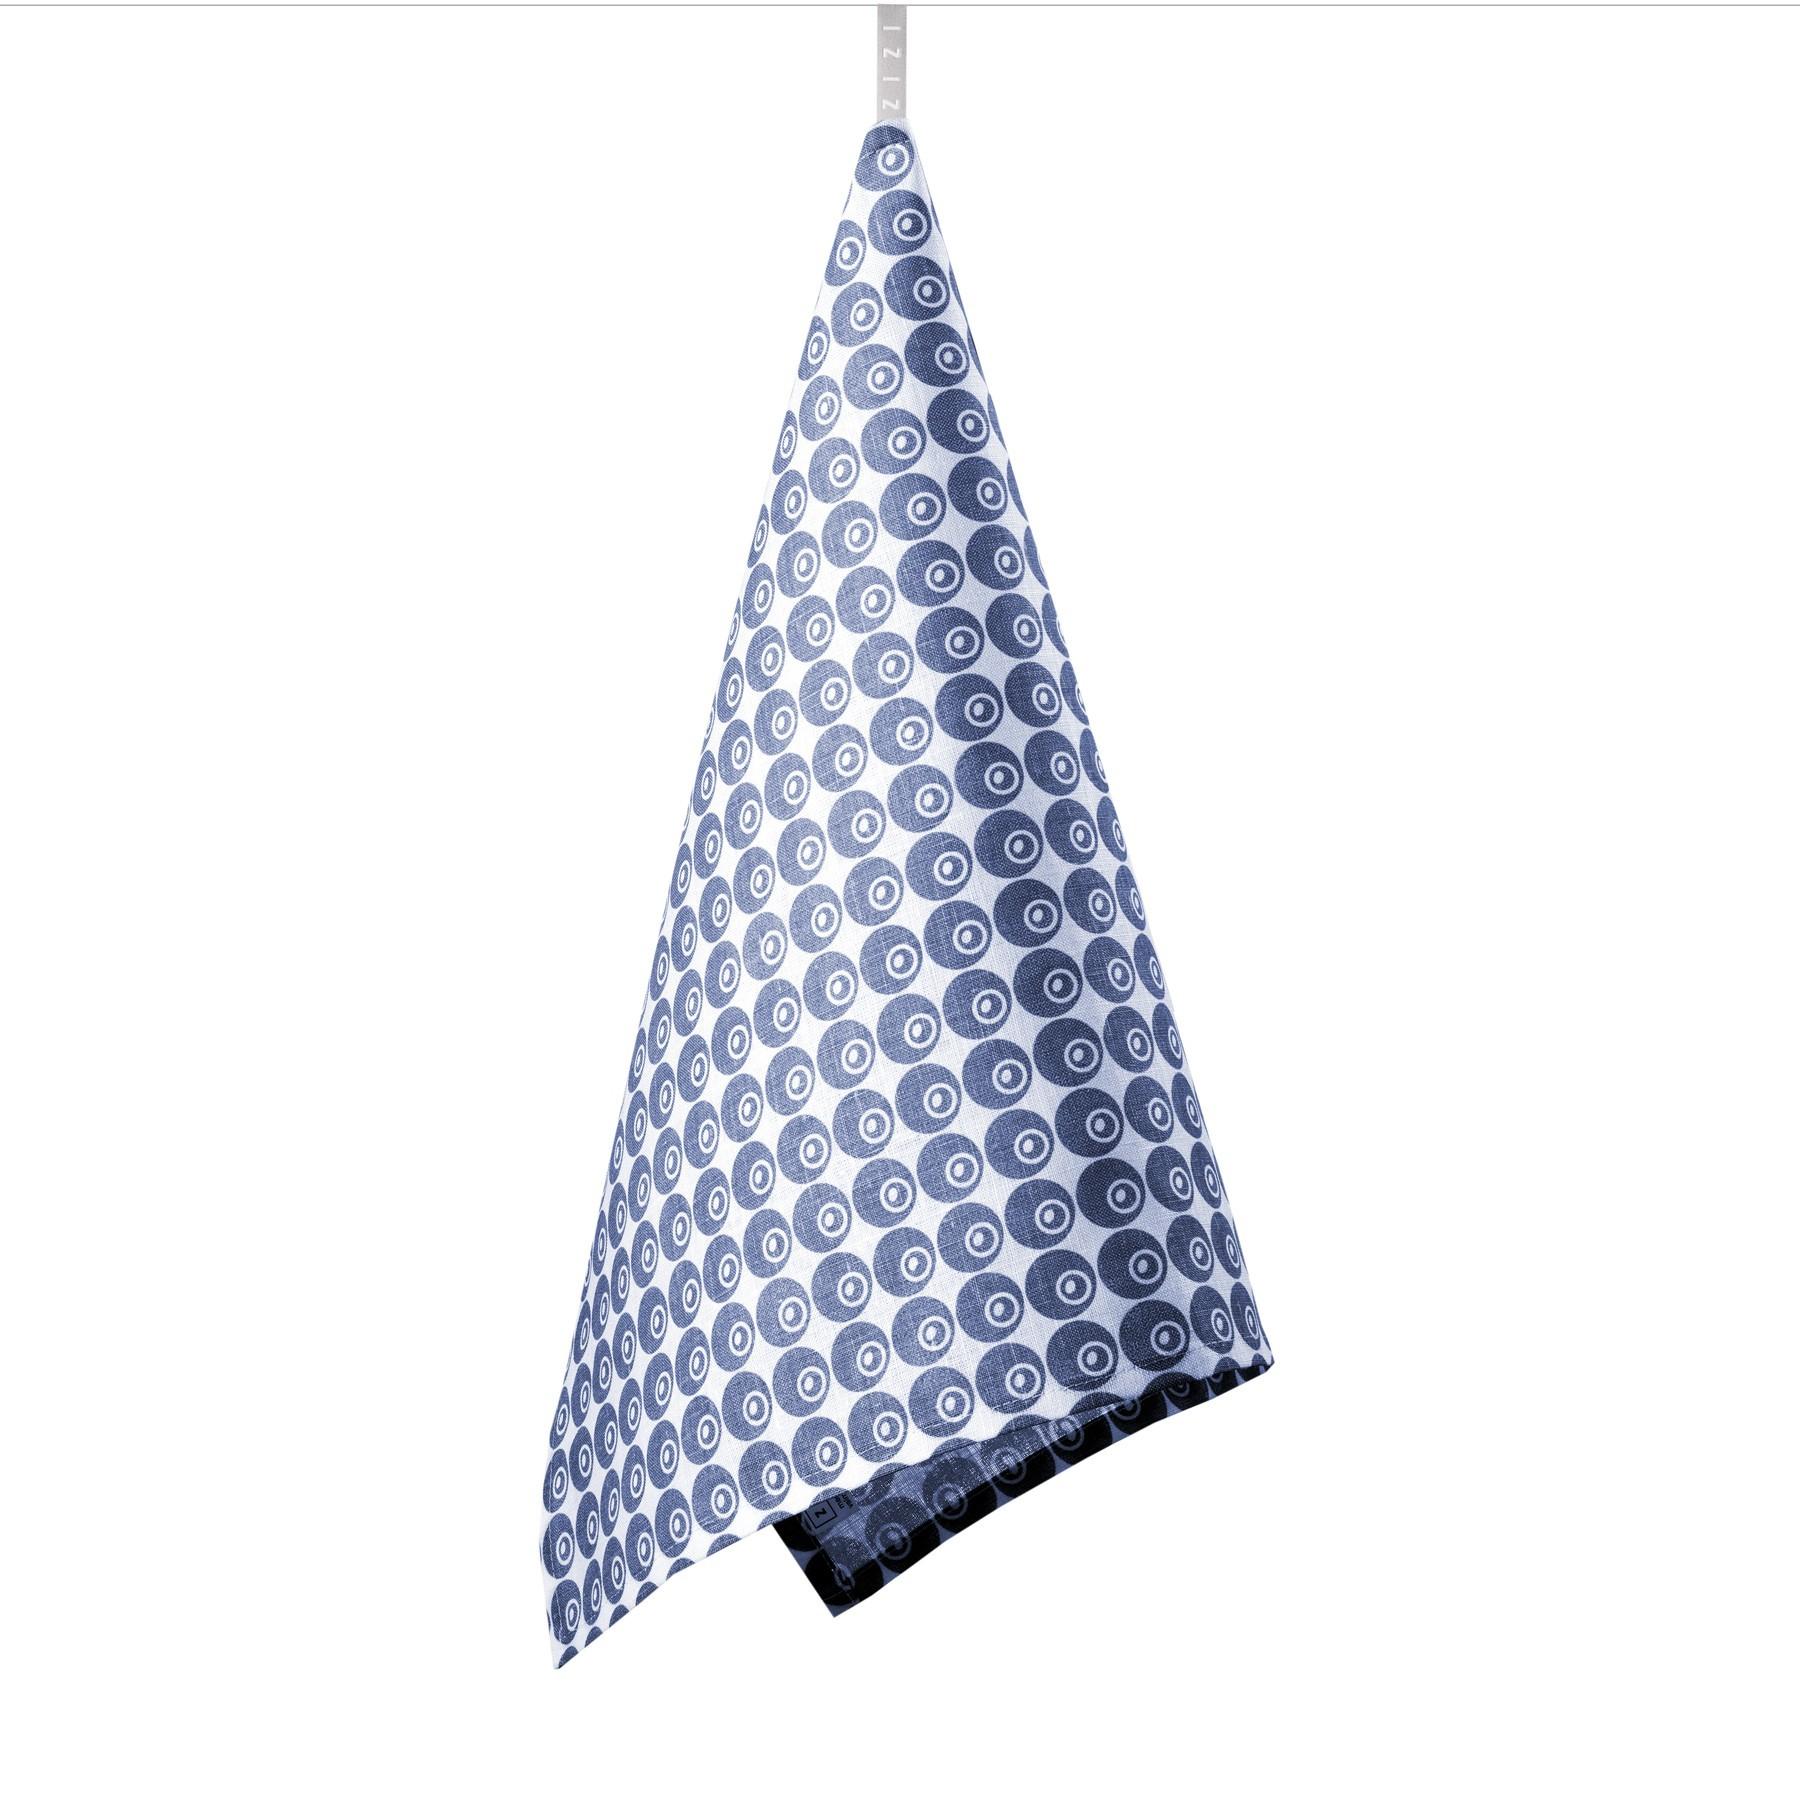 TEA TOWEL BERRY <br />blue